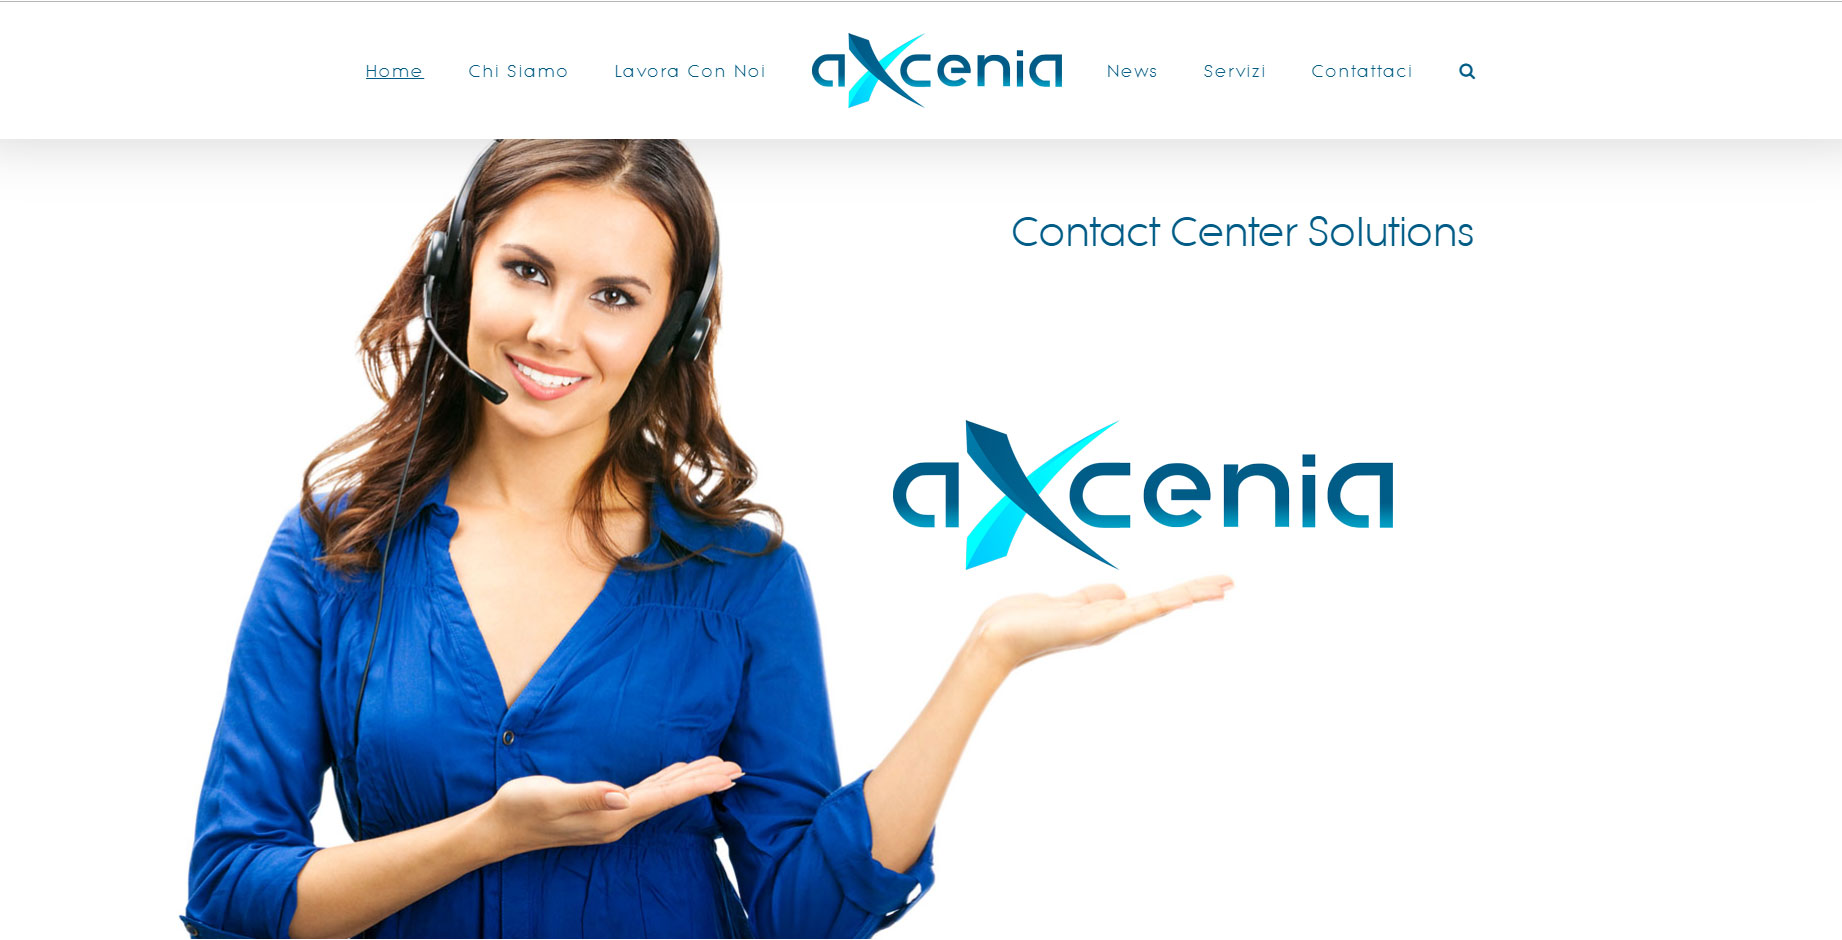 axcenia-portfolio-cover